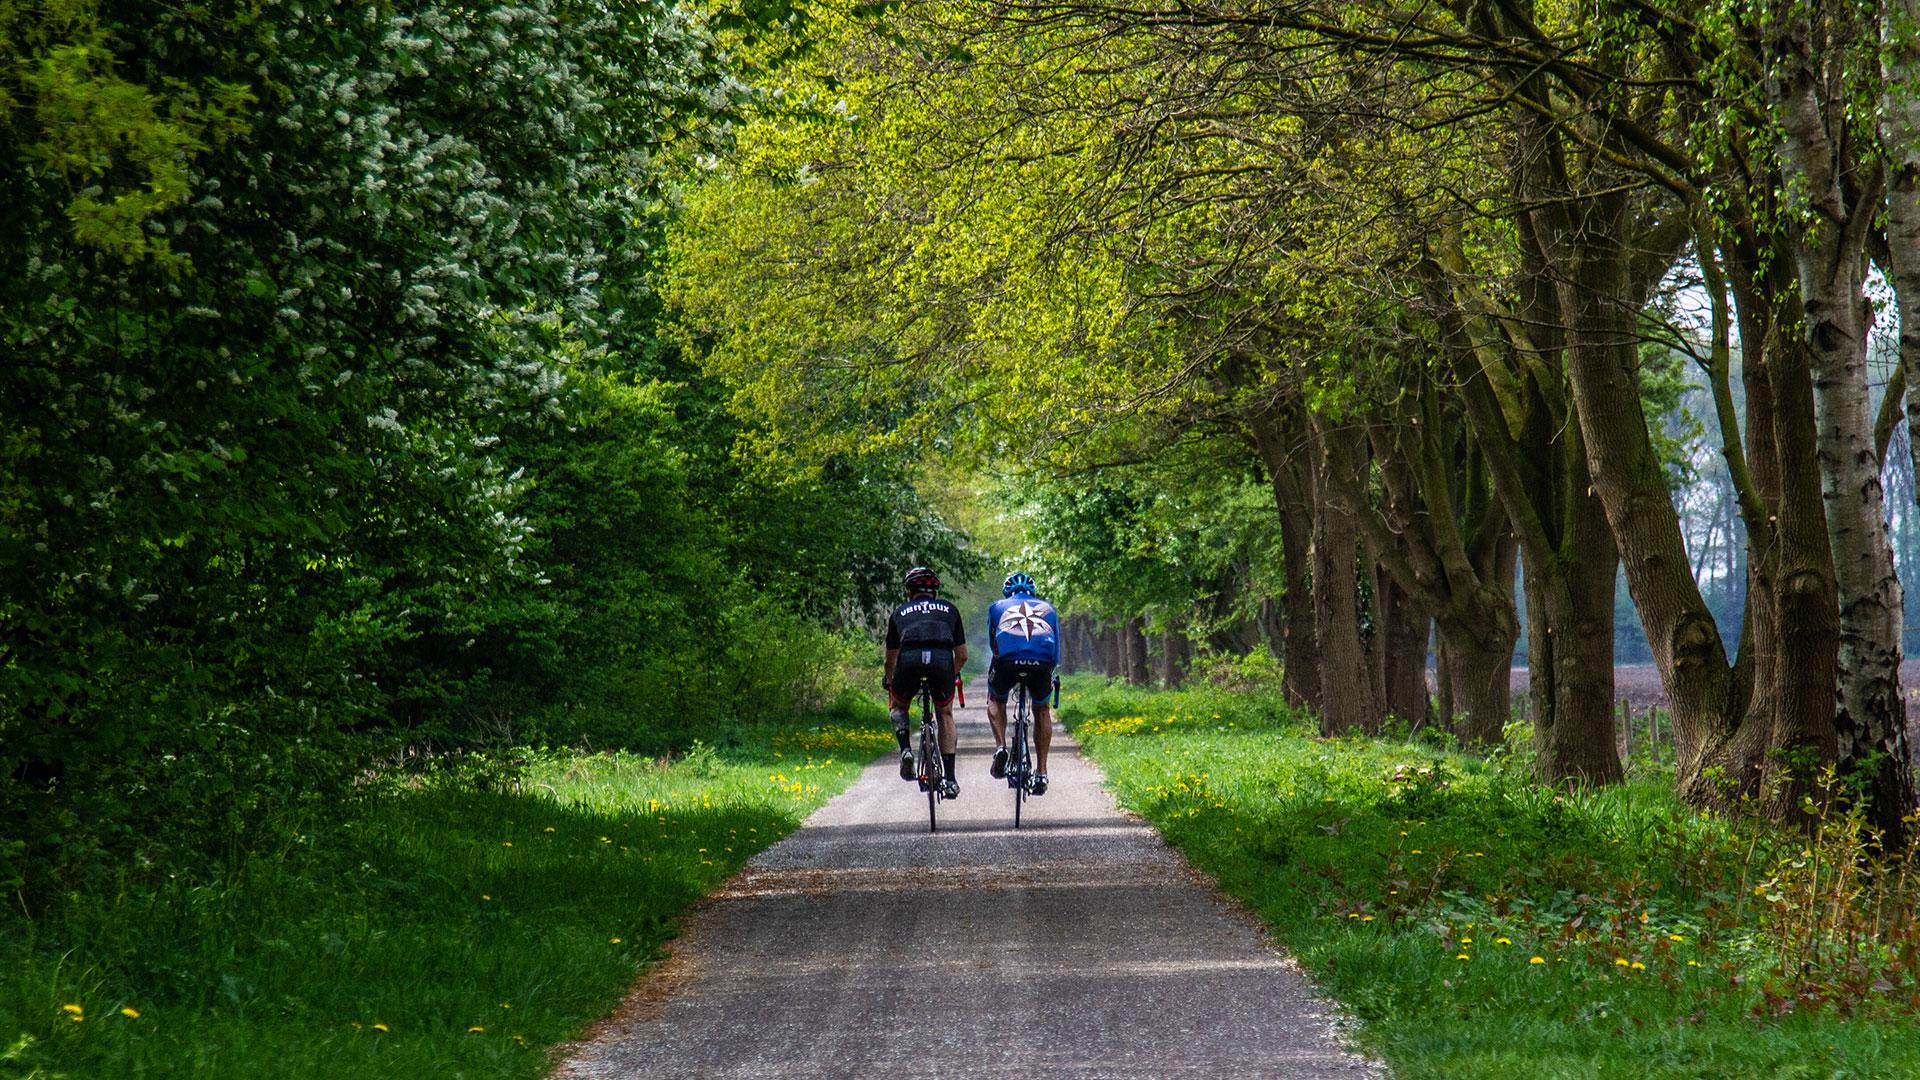 Routes rond Eindhoven voor wielrenners en gravelracers